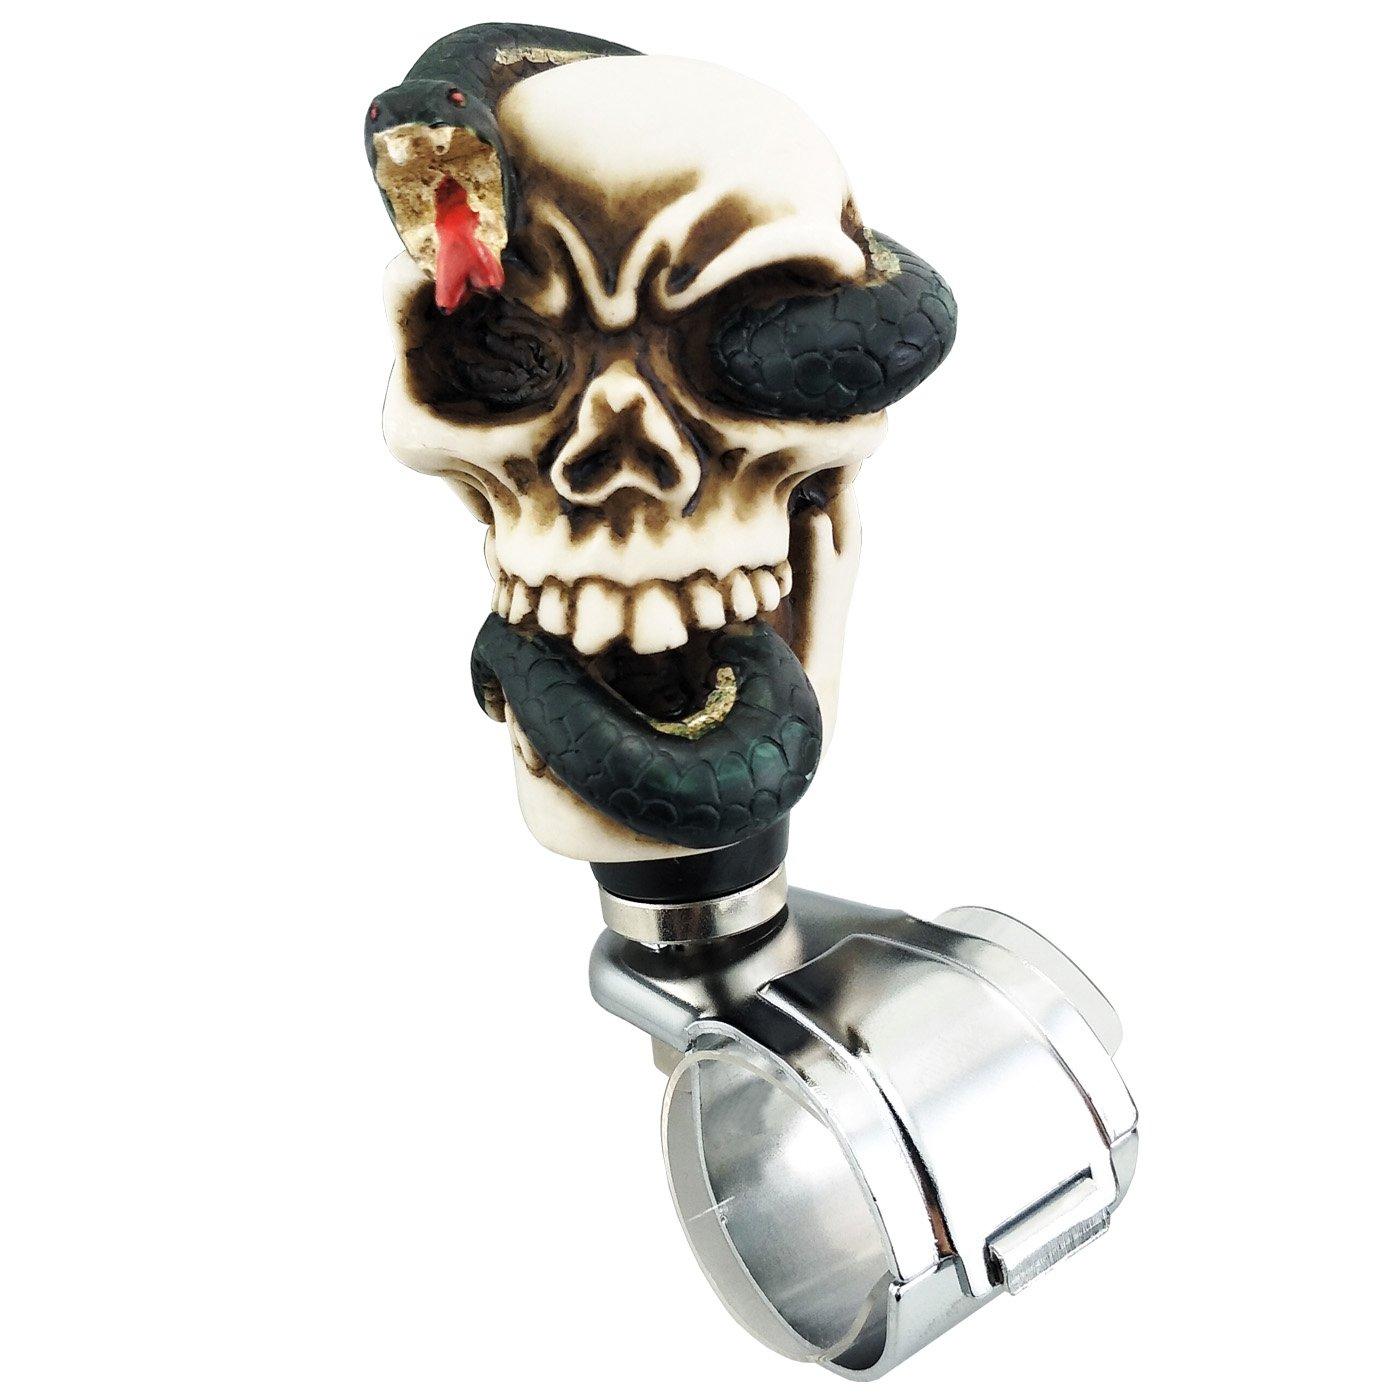 Gold Lensuntom LUNSOM Cool Steering Wheel Knob Removable Easy Rider Spinner Knob White Skull Universal Power Suicide Handle Quick Release Snake